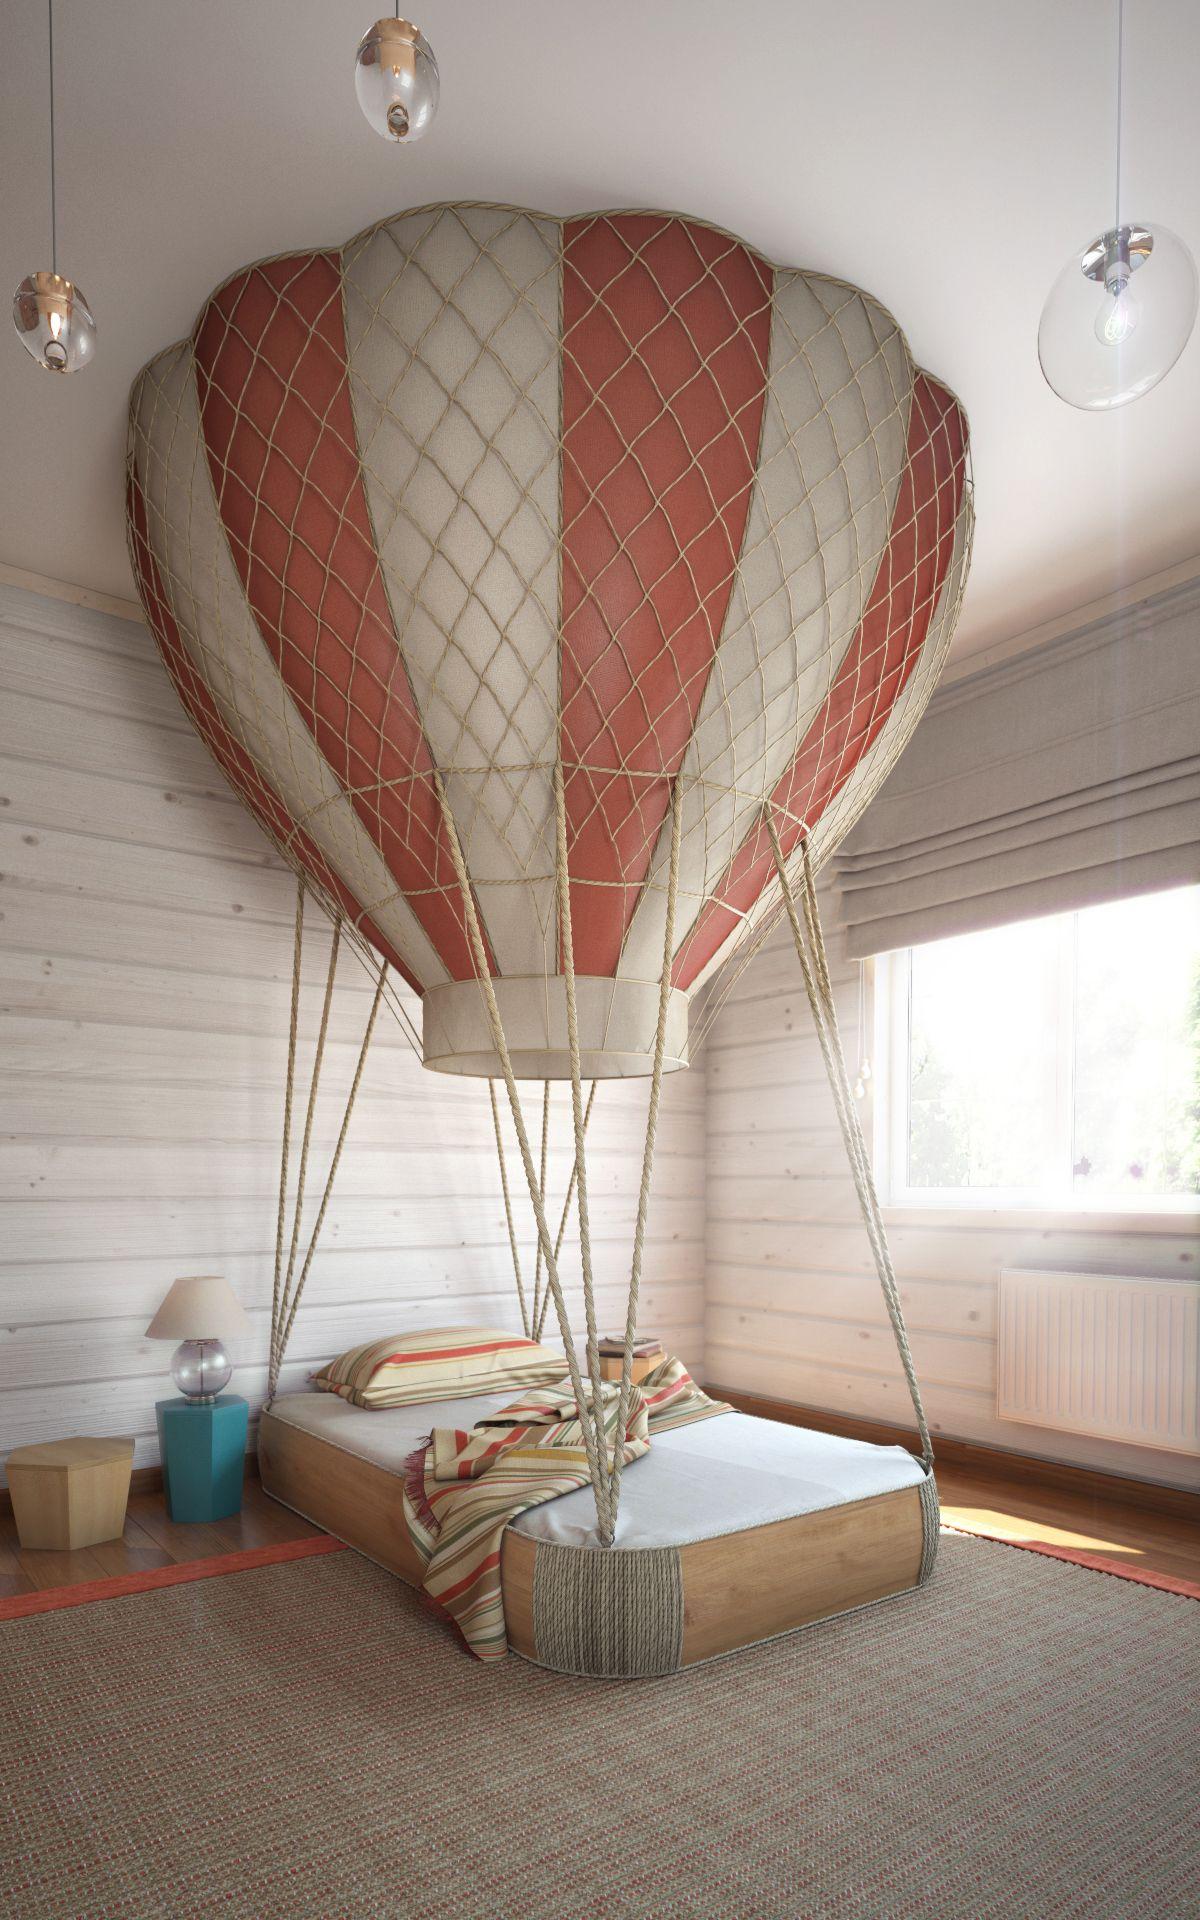 hot air balloon bed bedroom designed  anton saveliev